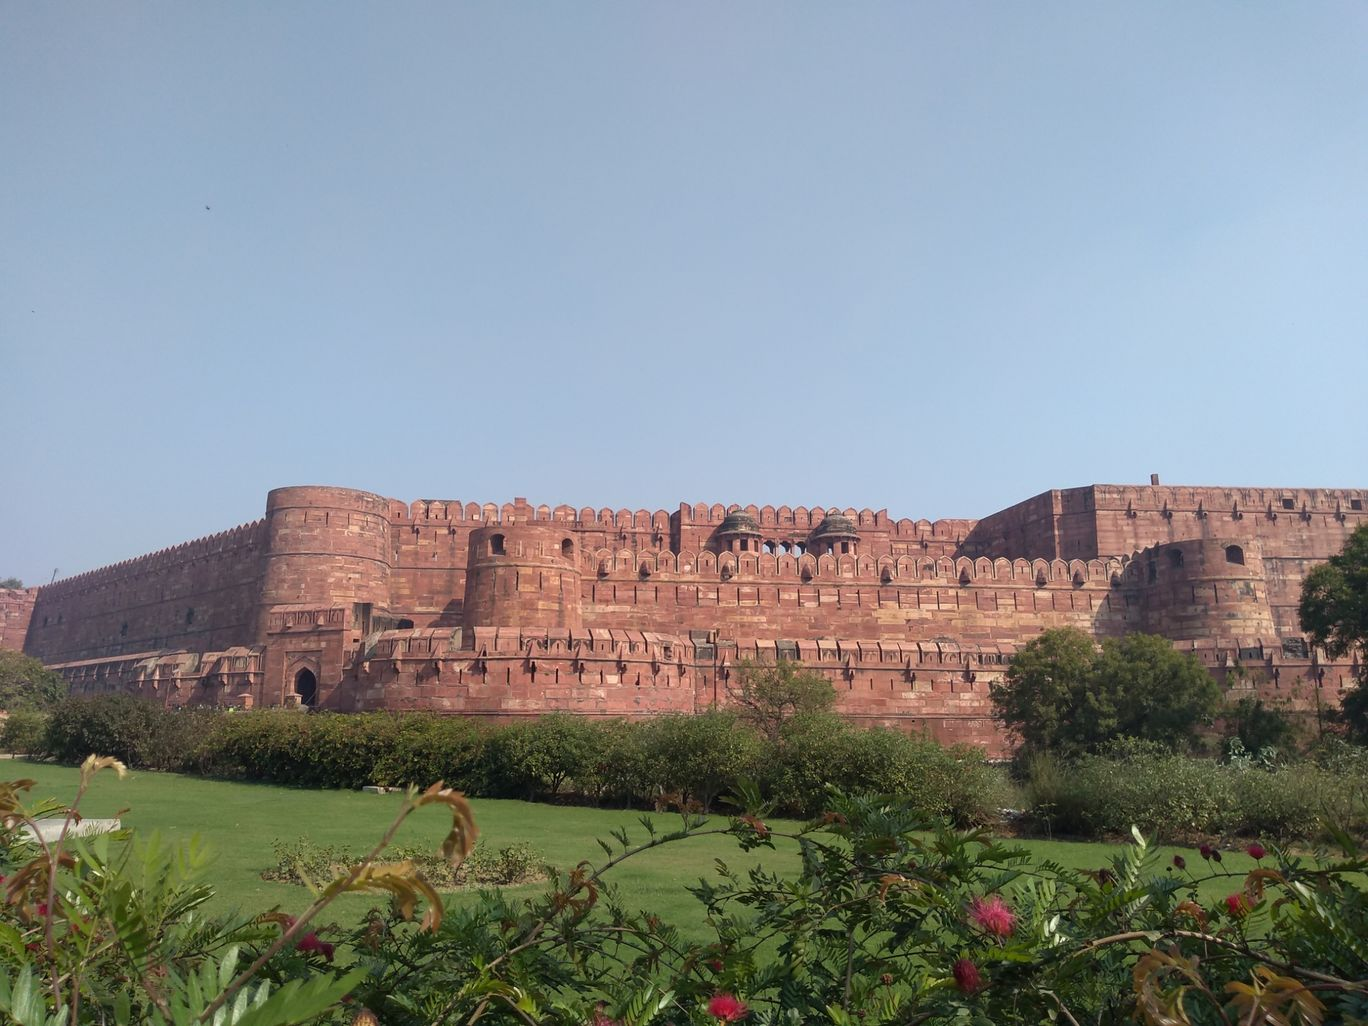 Photo of Agra Fort By Pramita R. Thakker